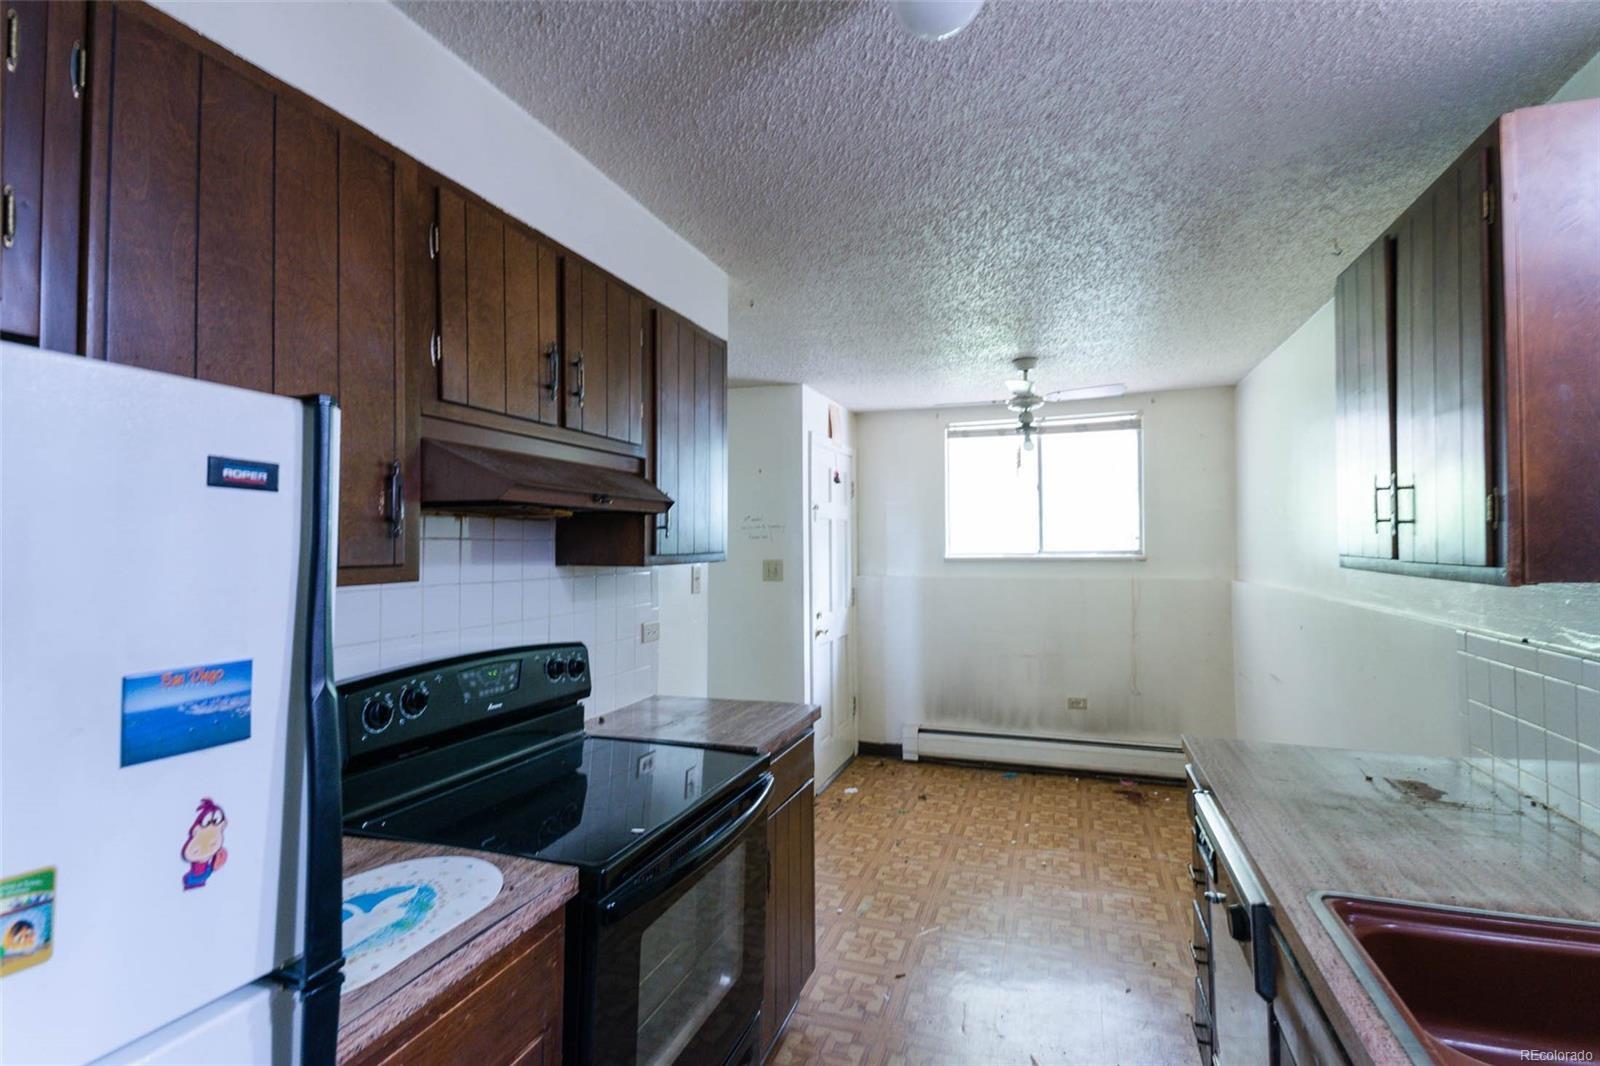 MLS# 6228473 - 3 - 1525 S Holly Street #107, Denver, CO 80222